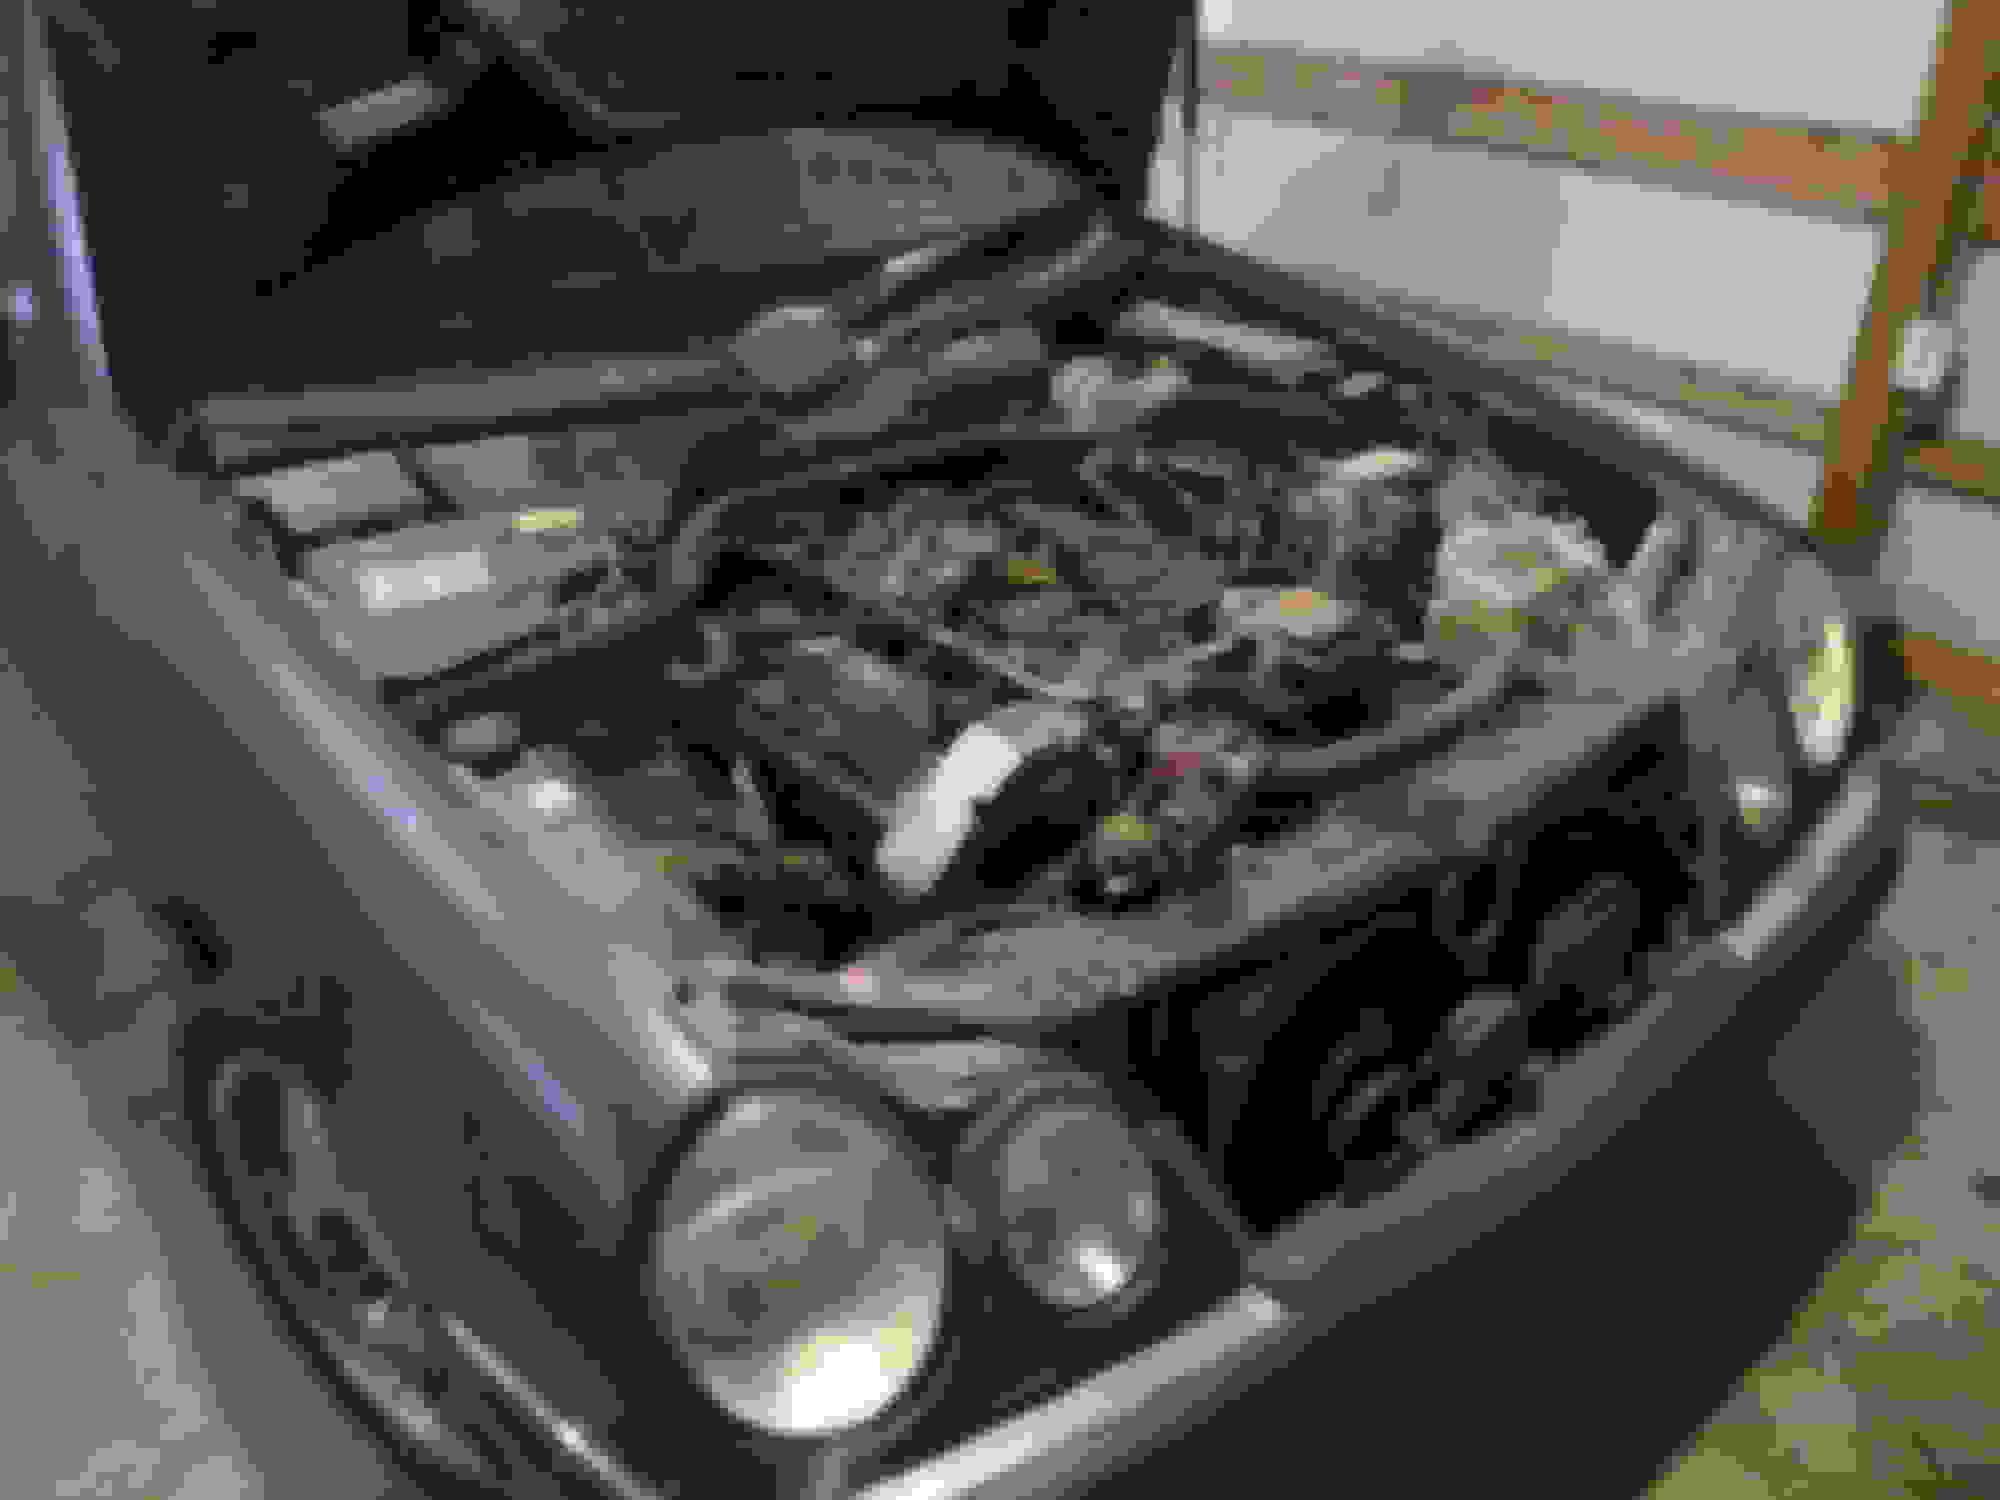 Benz LS swap - Third Generation F-Body Message Boards